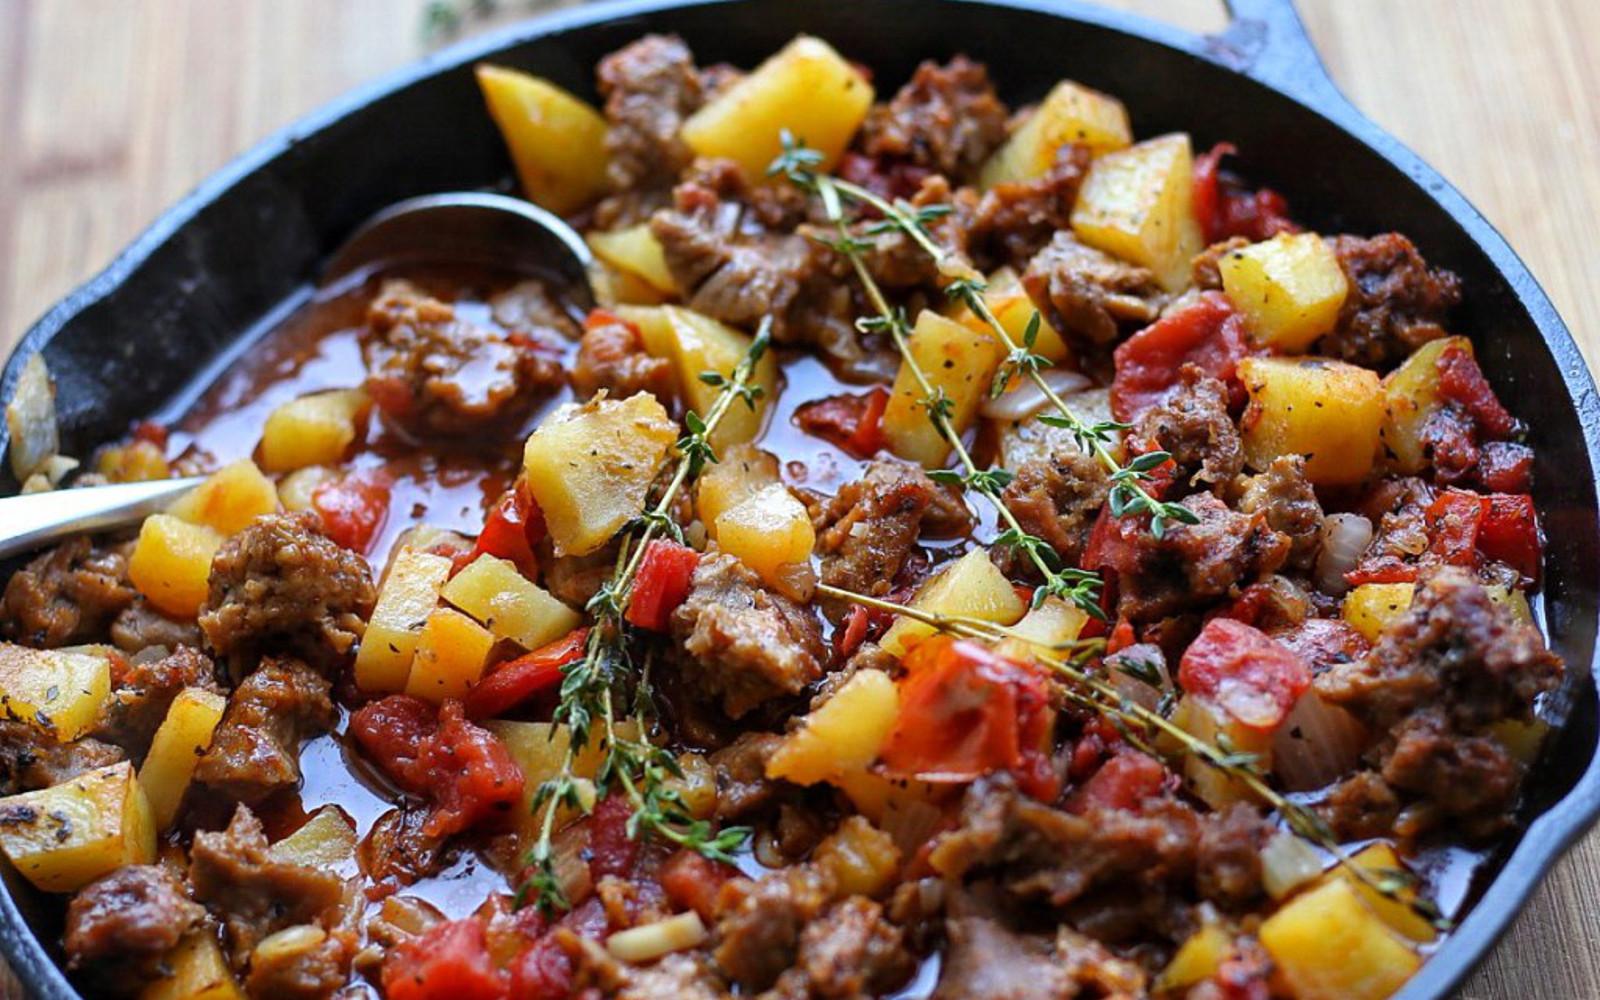 'Meat' and Potato Casserole